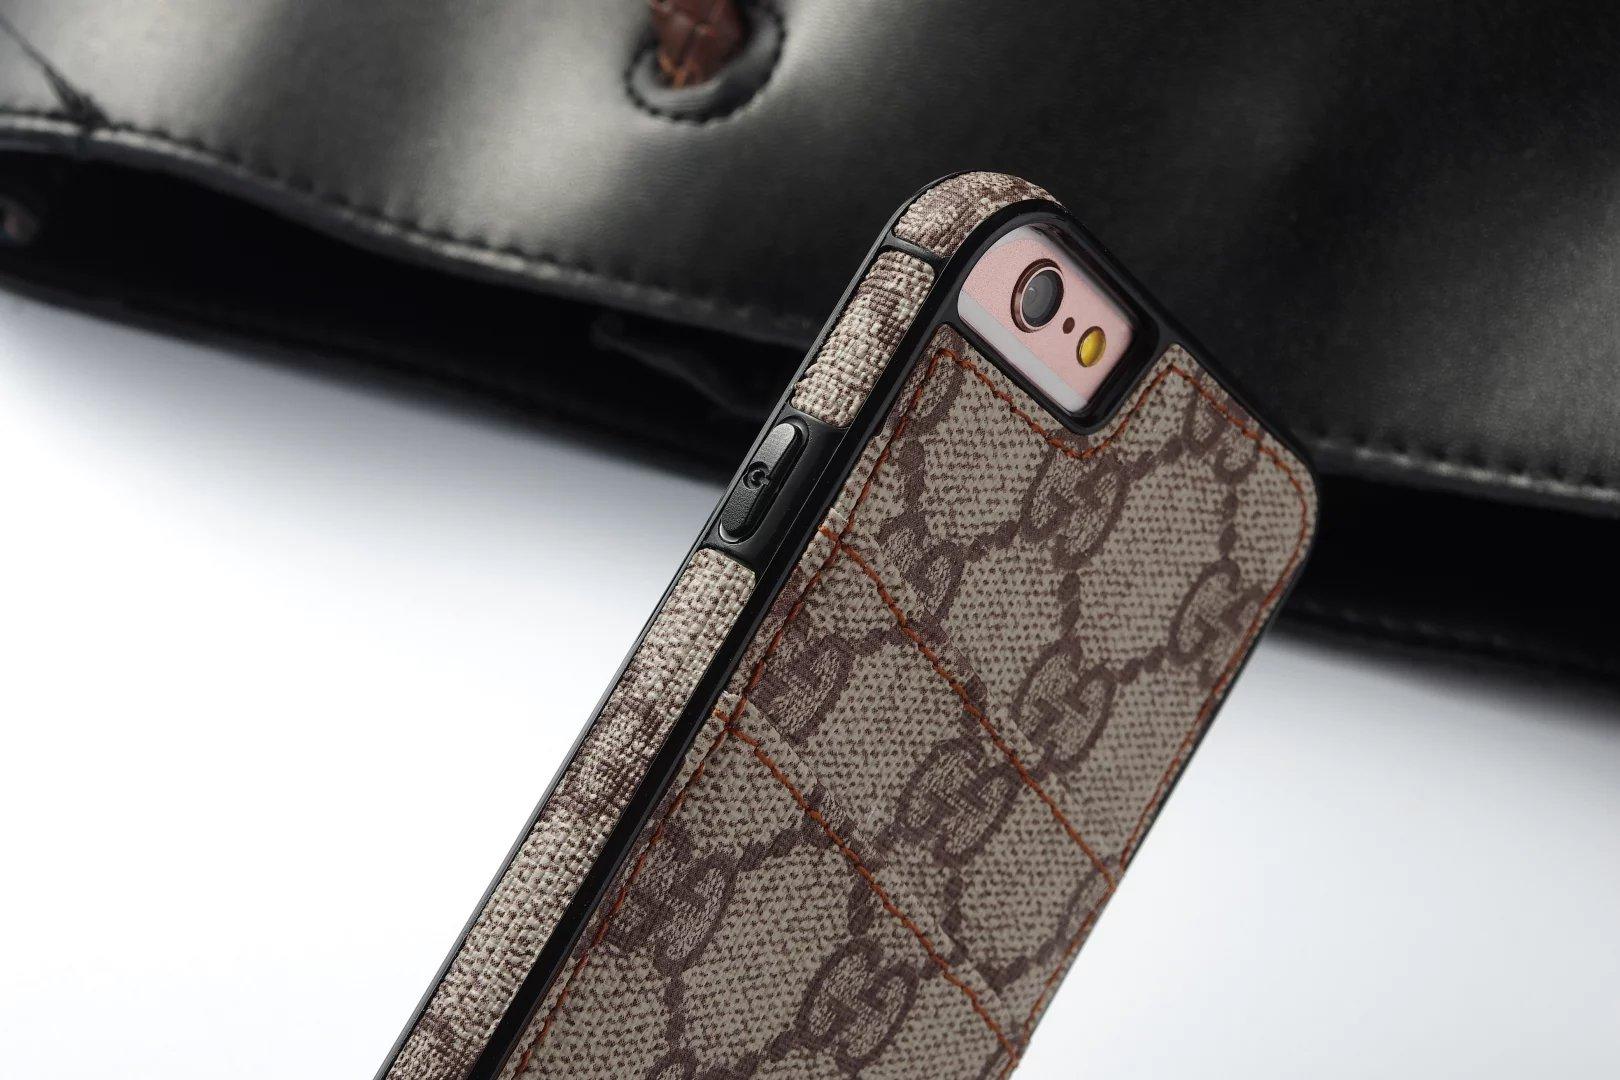 case für iphone filzhülle iphone Gucci iphone6s hülle was6srdichte hülle iphone 6s preis für iphone 6 wann kommt das nächste iphone iphone hülle was6srdicht schutz für iphone 6s iphone 6s kas6sttenhülle